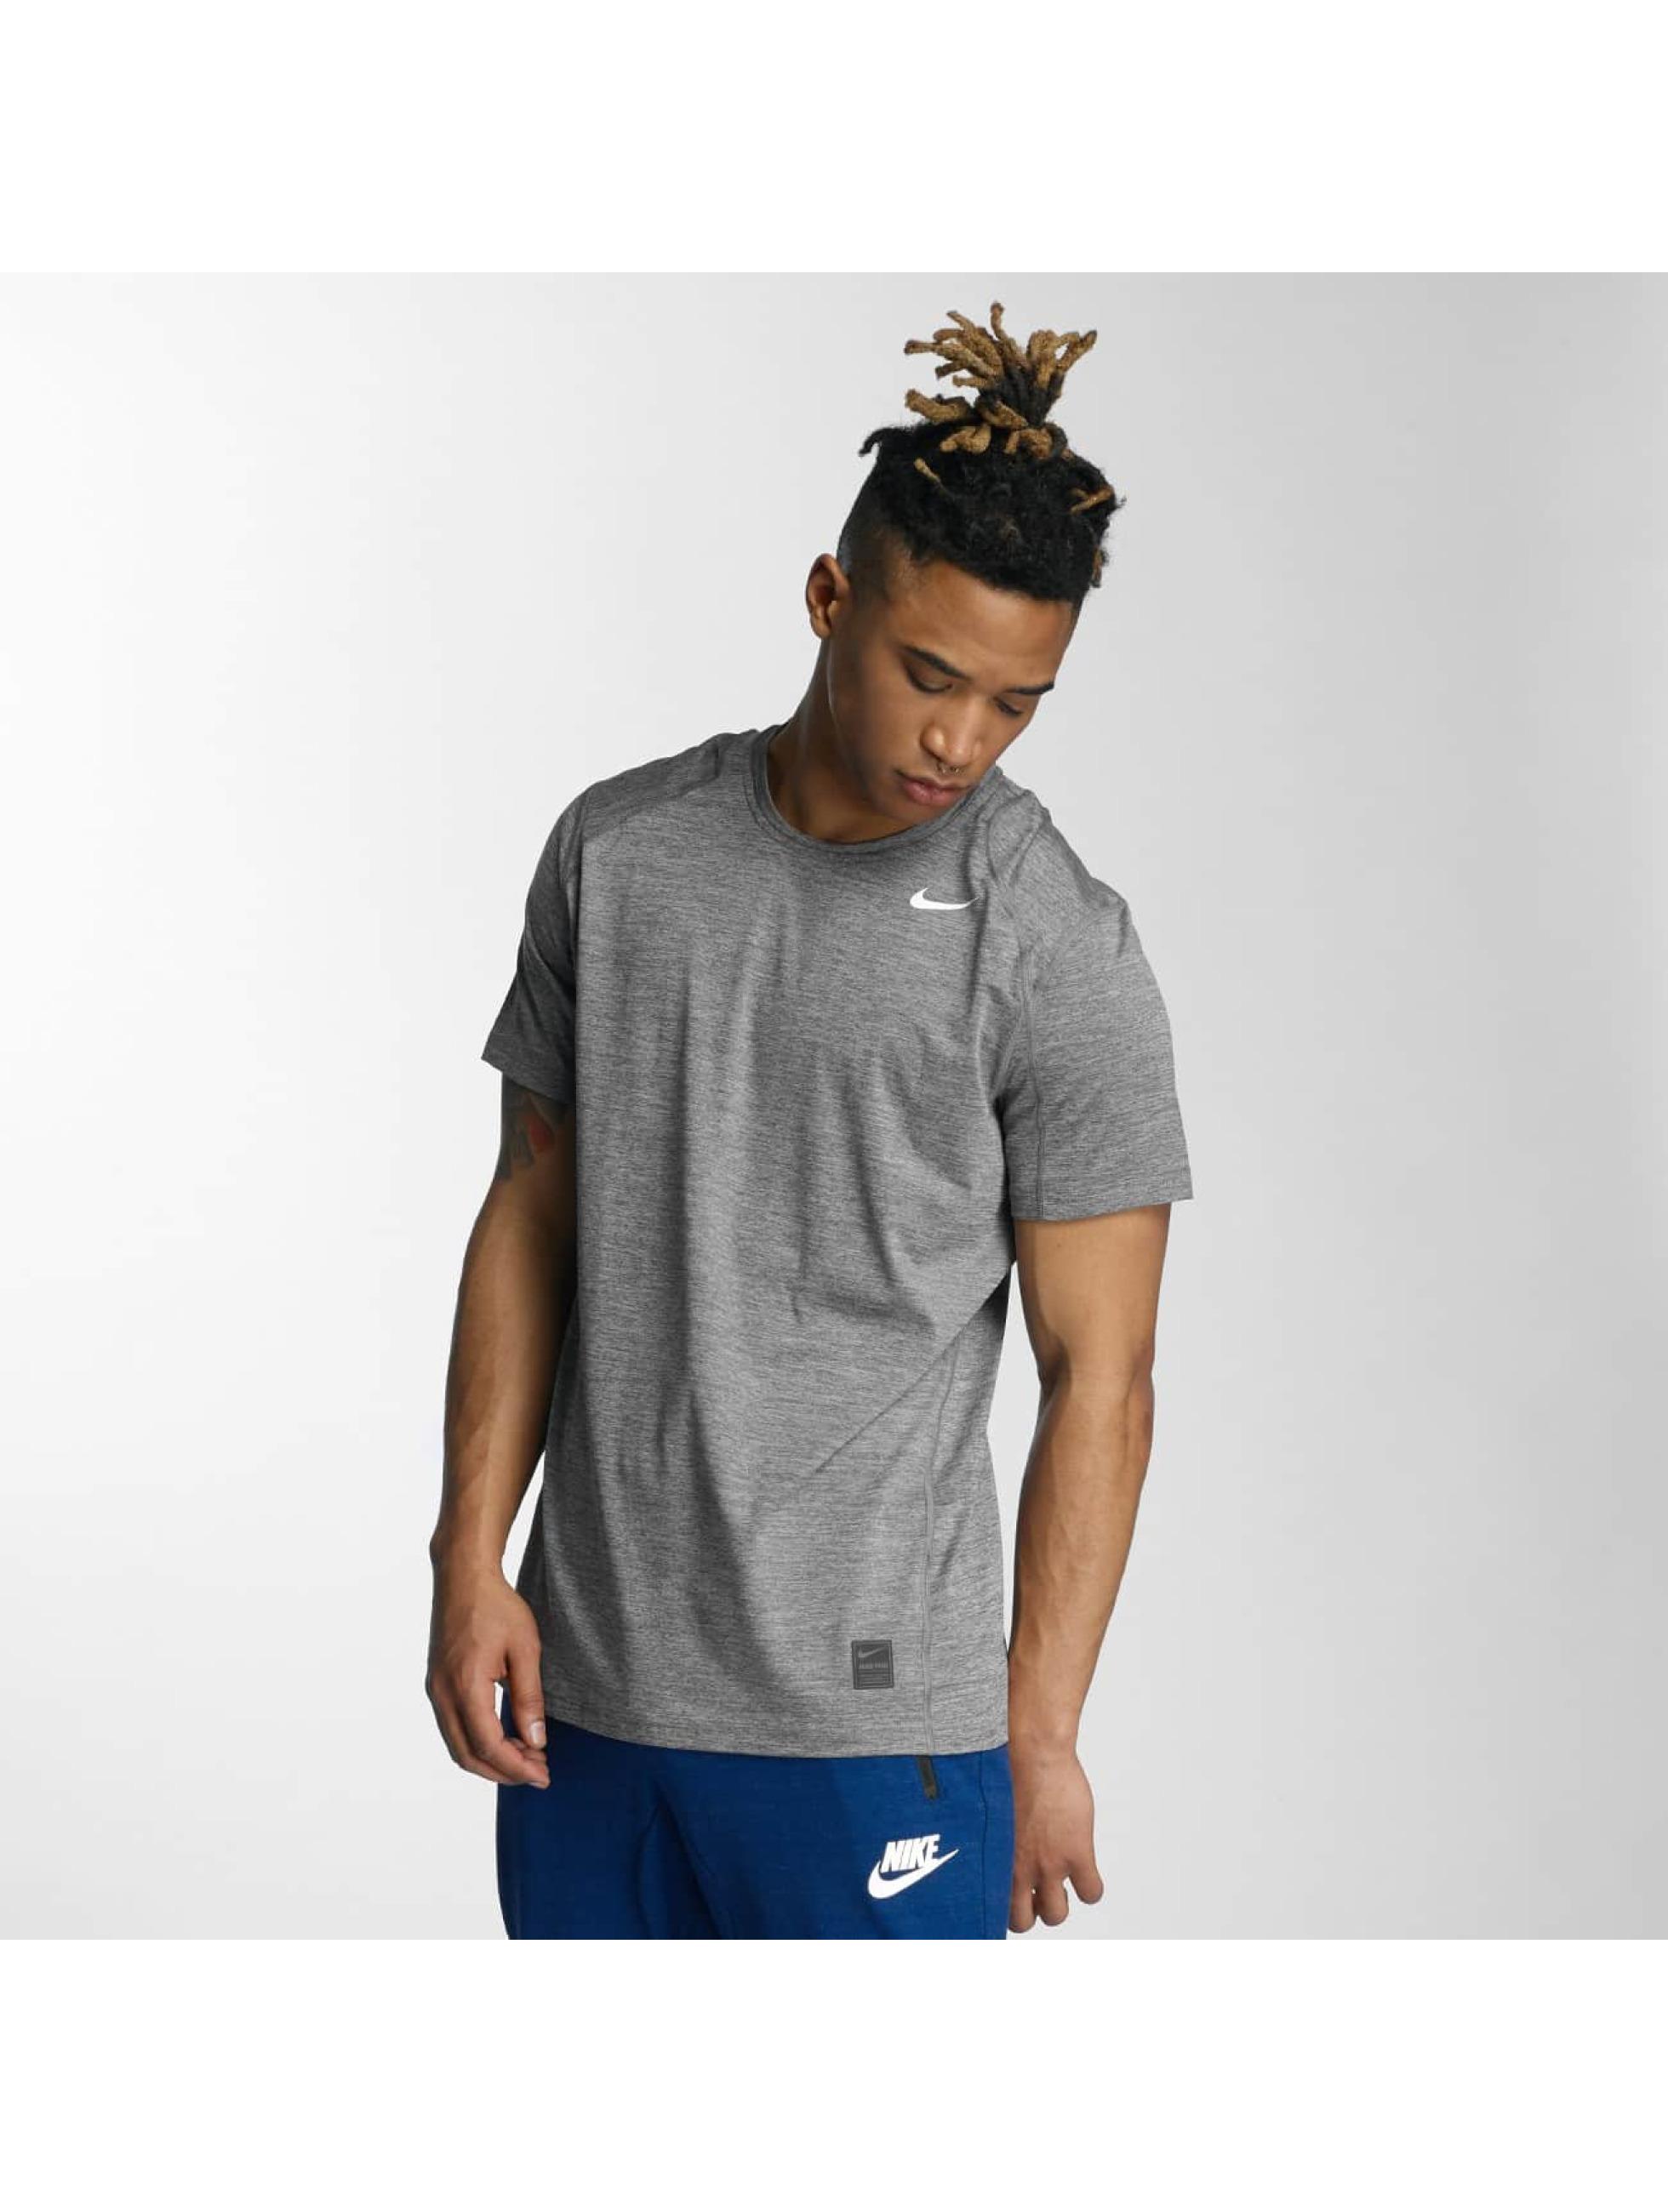 Nike Performance Männer T-Shirt Top in grau